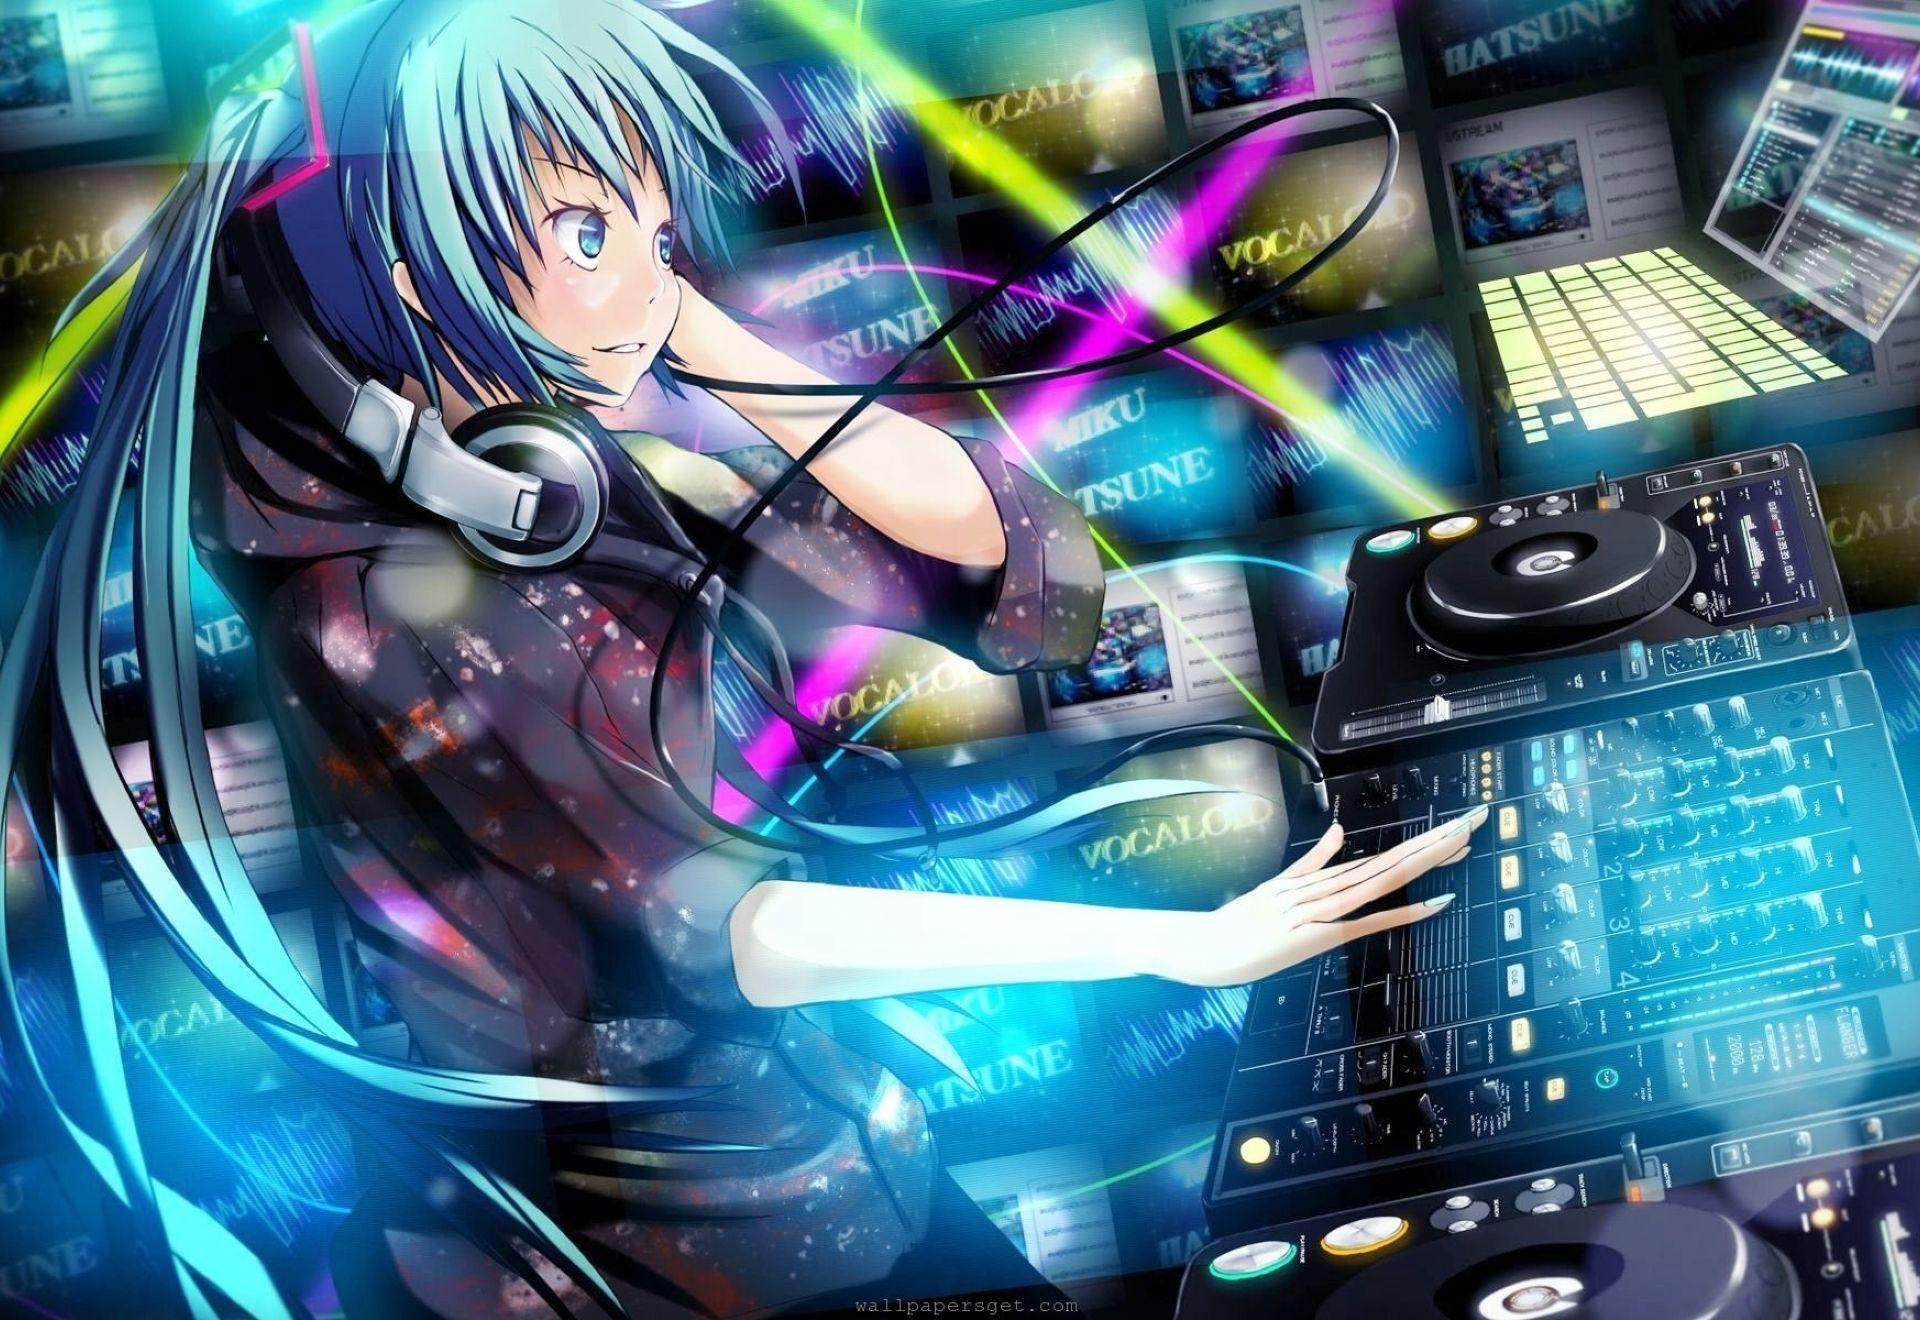 Anime Dj Music Wallpaper Anime Dj 1086178 Hd Wallpaper